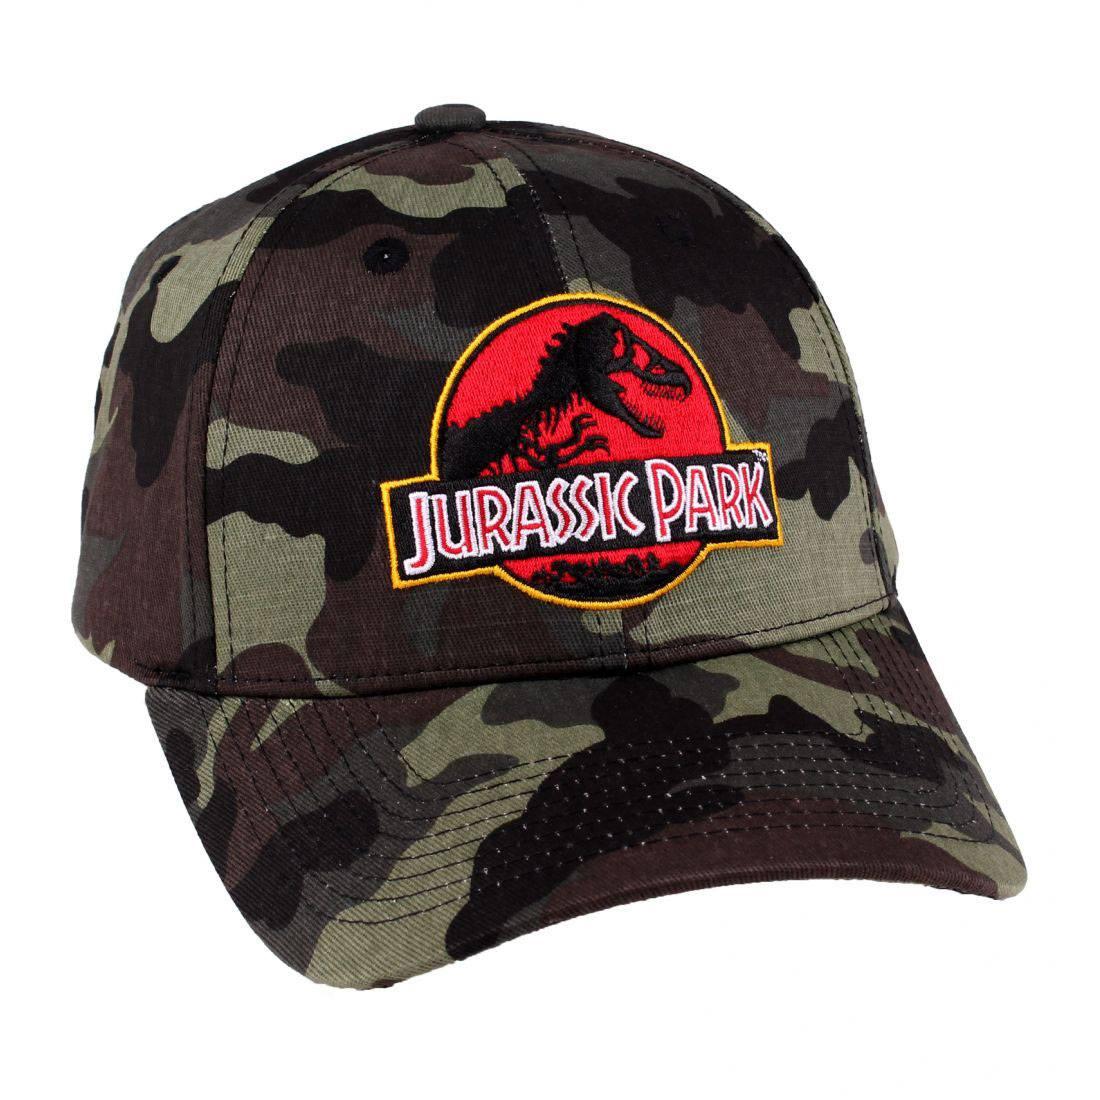 Jurassic Park Baseball Cap Camouflage Logo